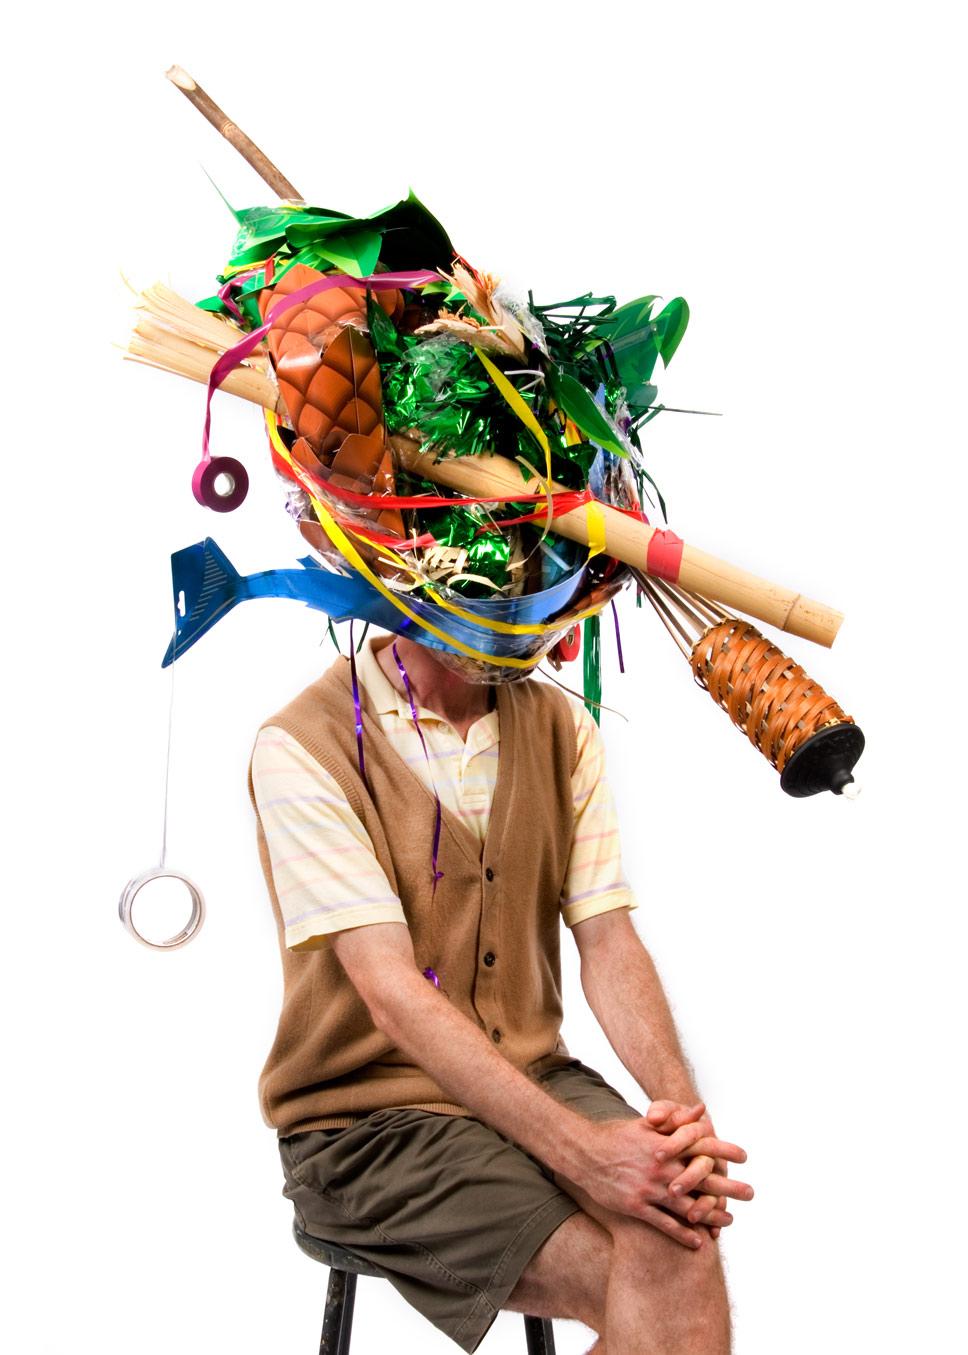 Untitled (tiki) 2 2009